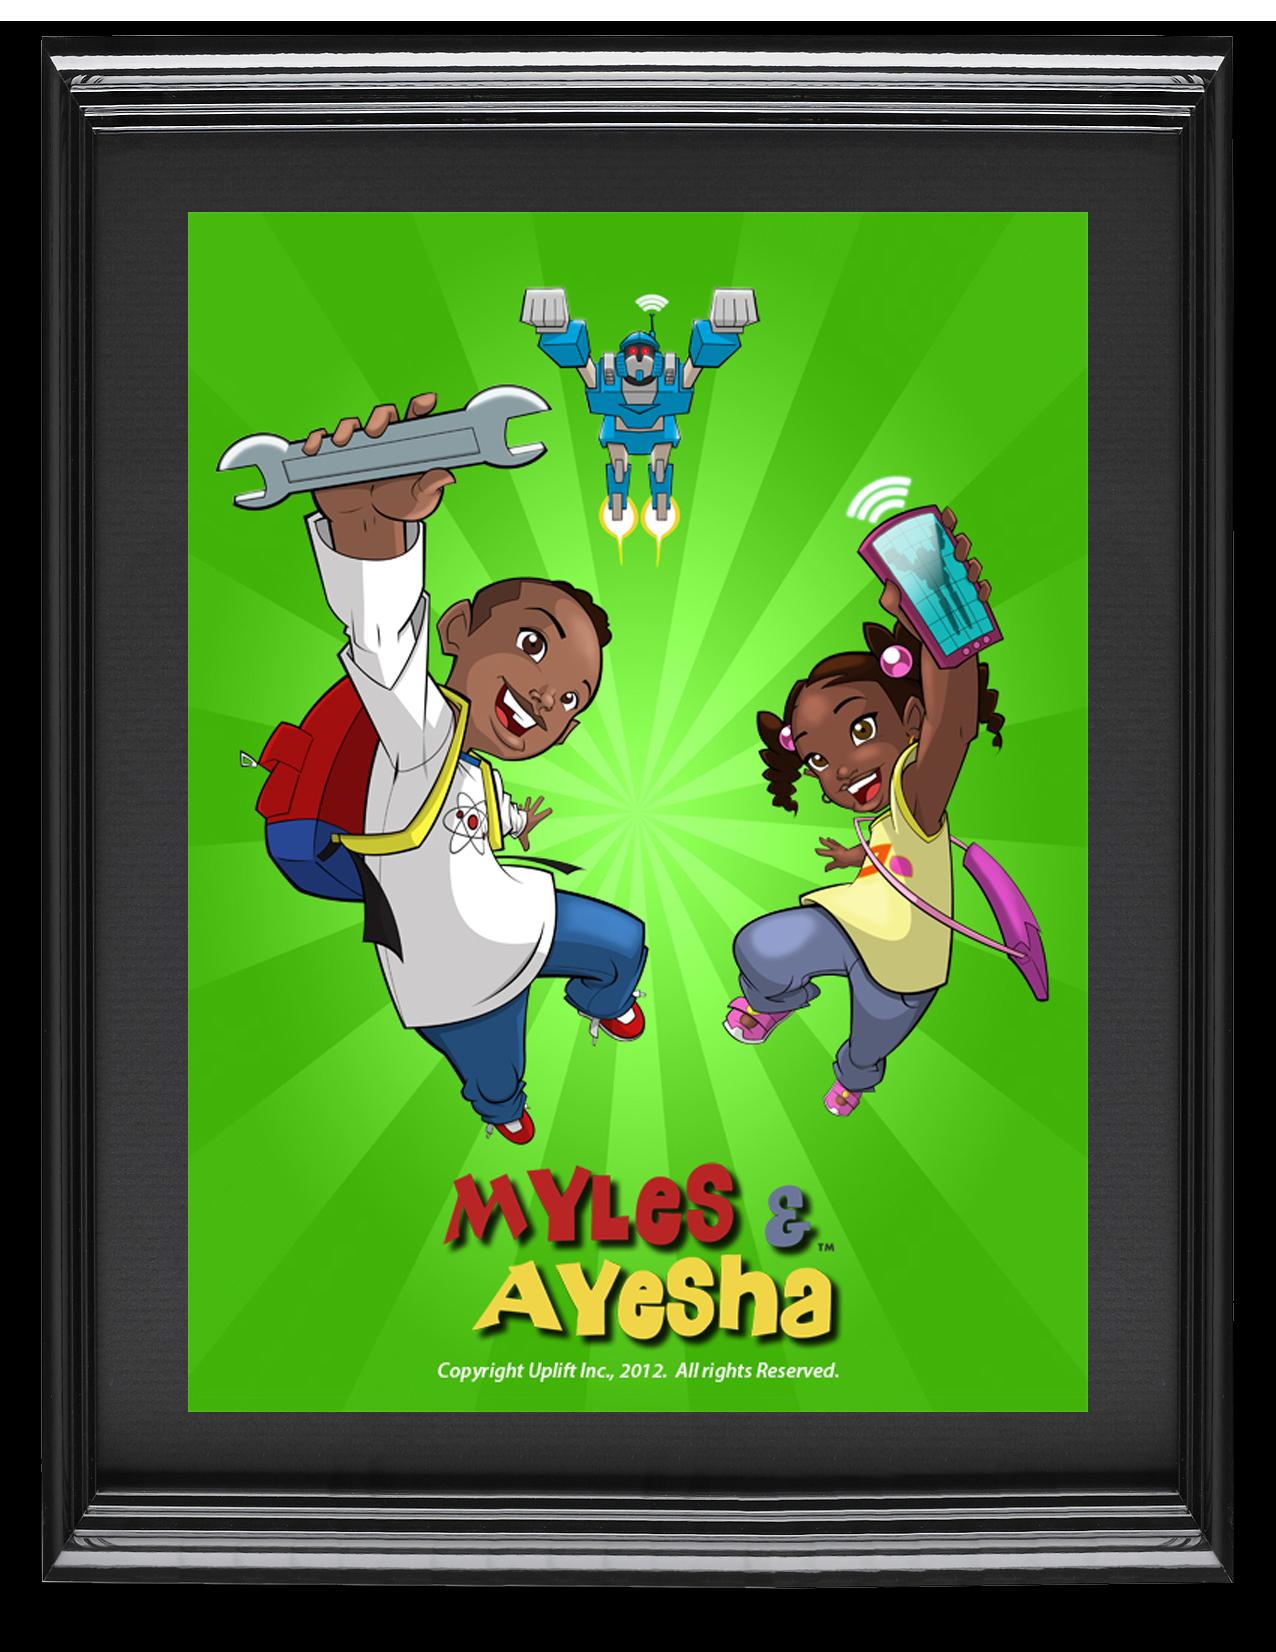 Myles & Ayesha